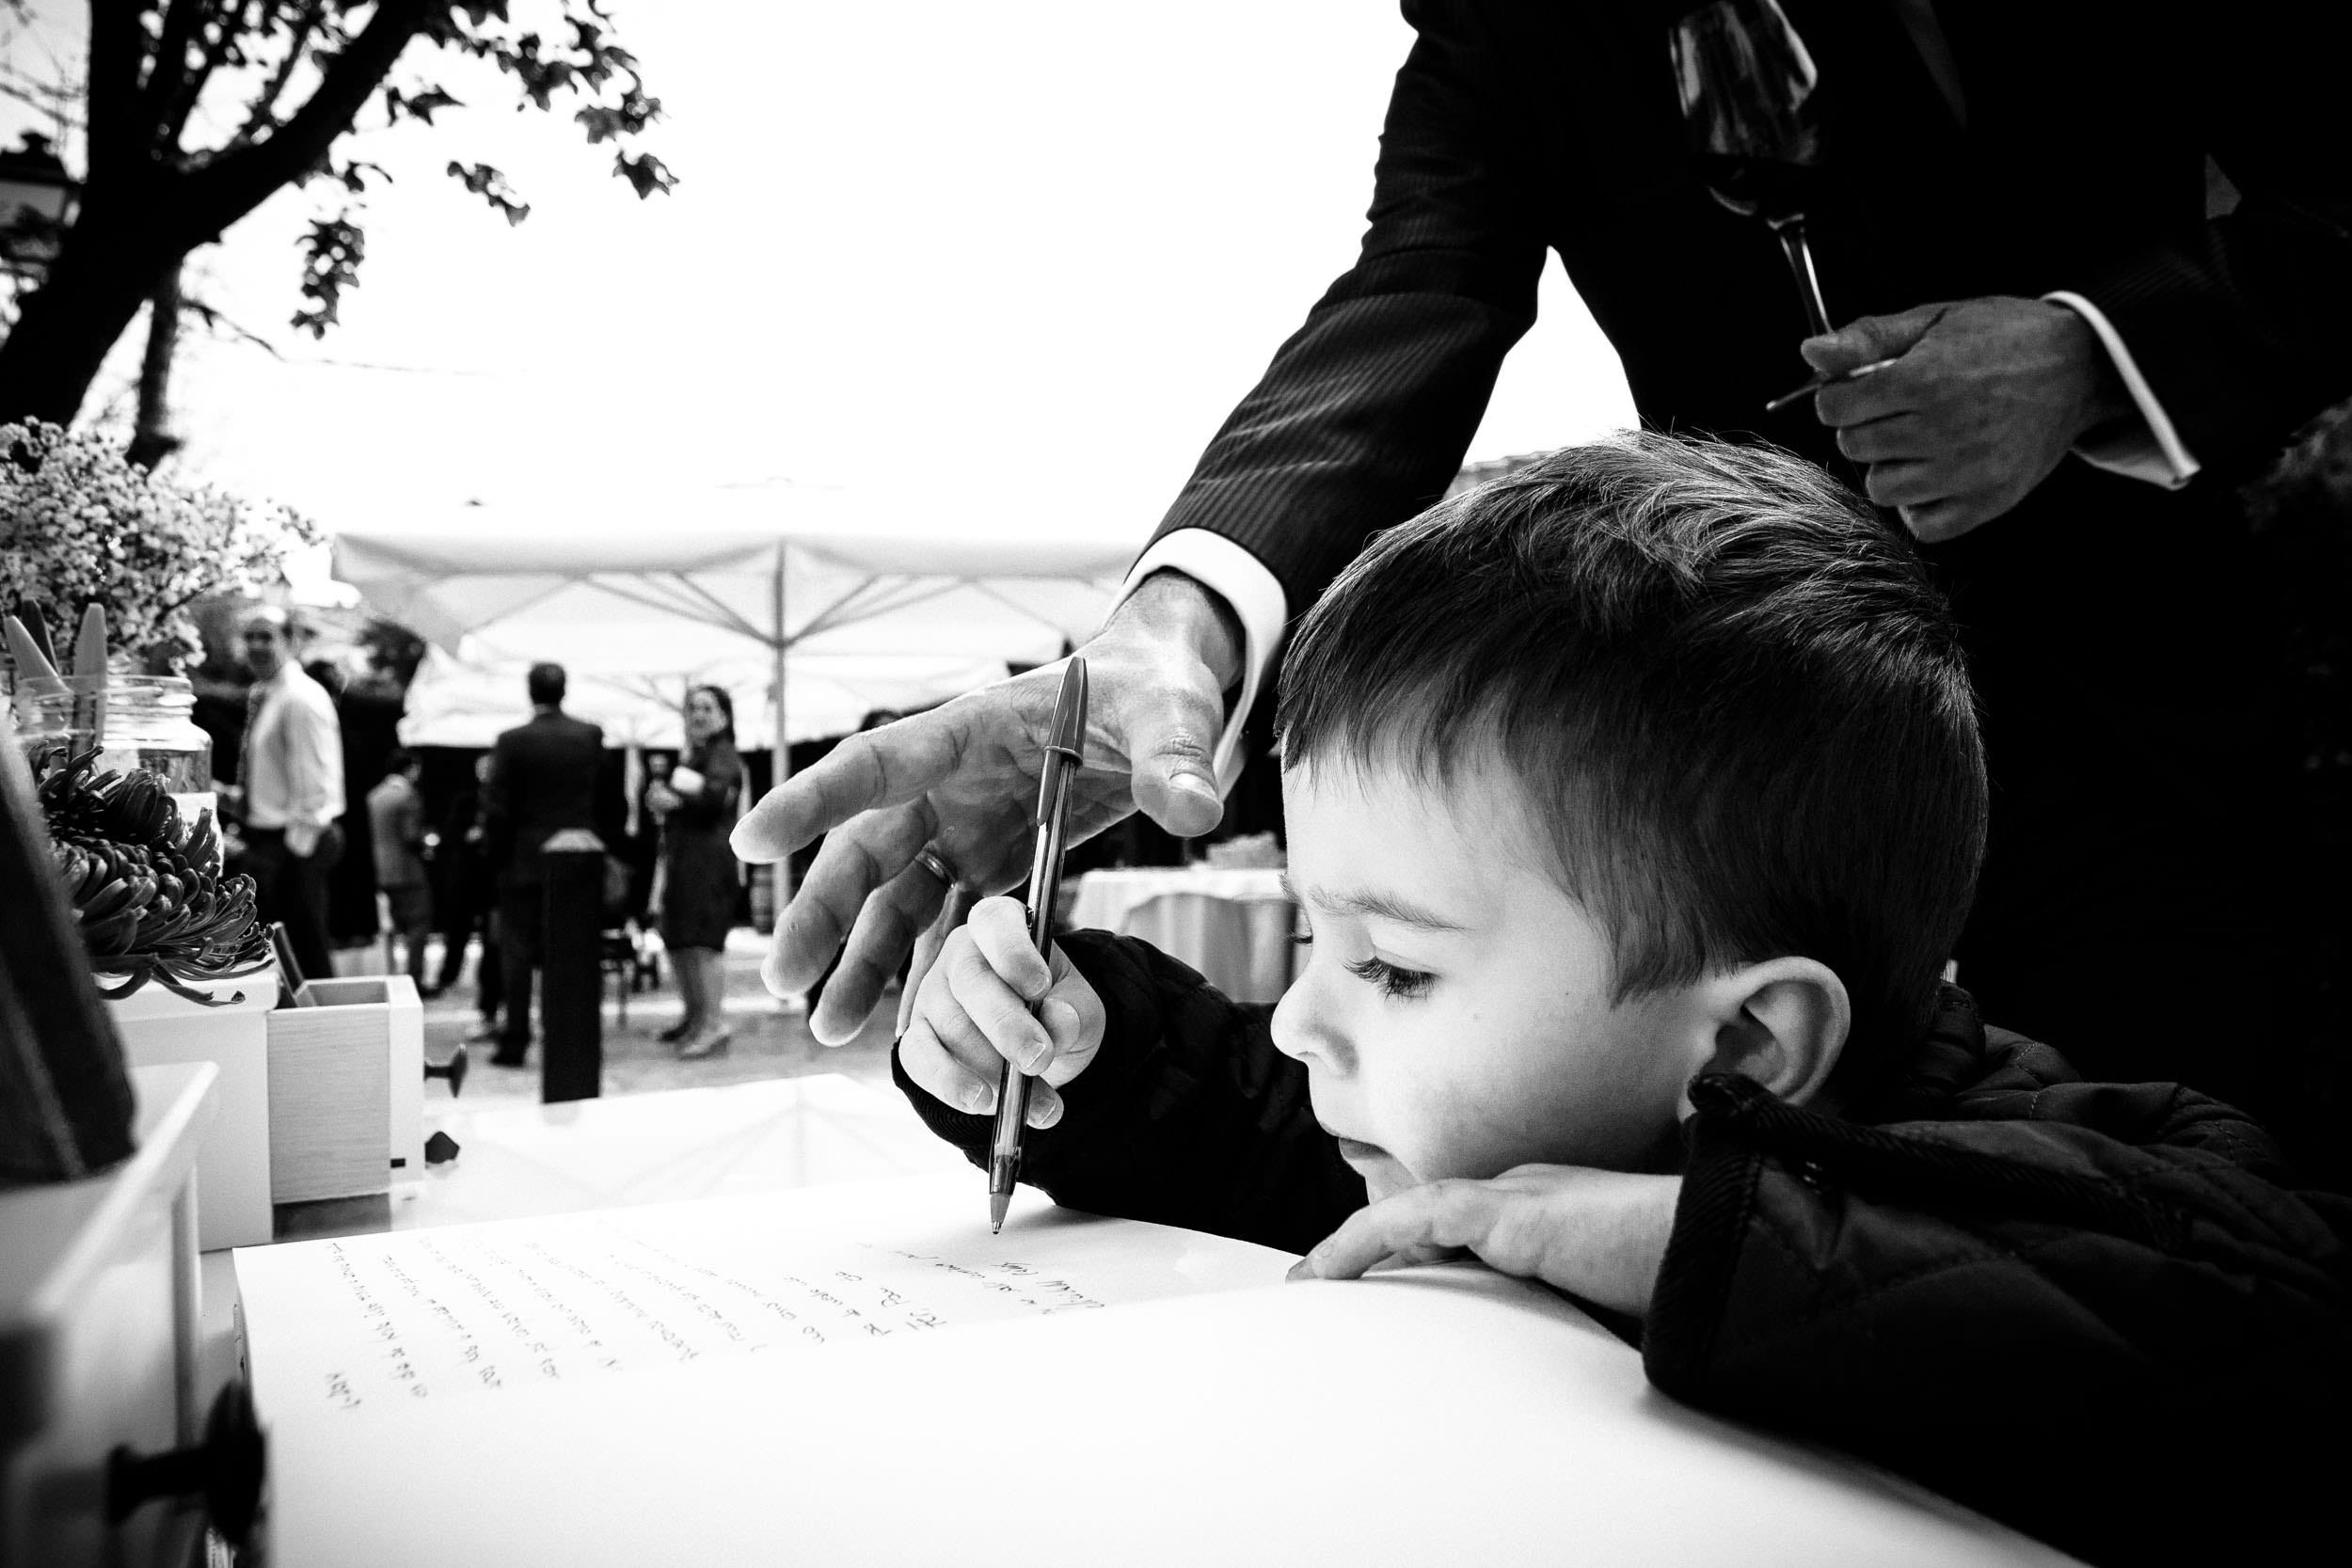 Wedding Photographer La Rioja Basque Country Spain - James Sturcke - sturcke.org_054.jpg